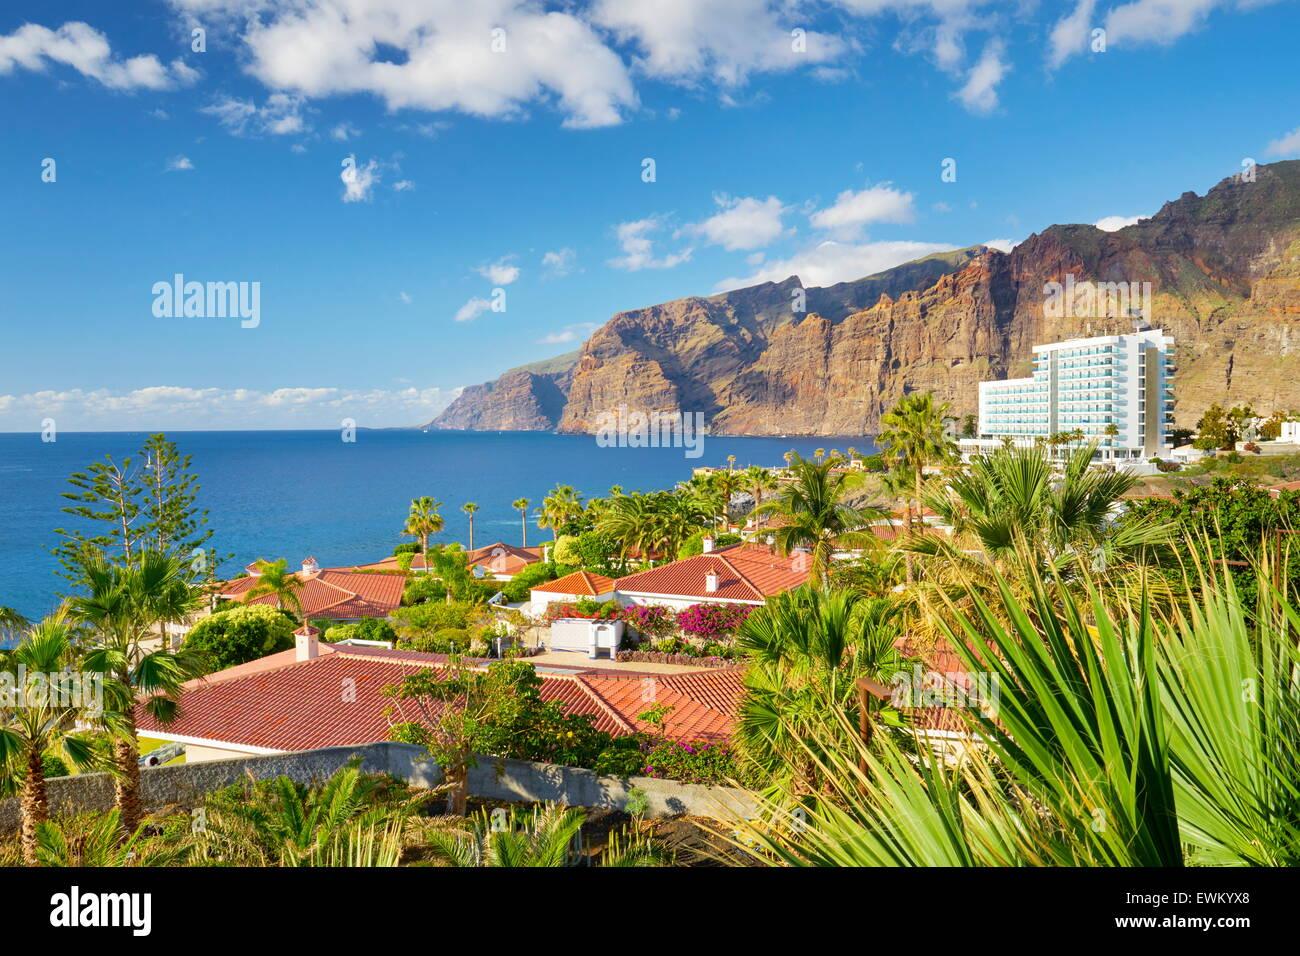 Teneriffa, Los Gigantes, Kanarische Inseln, Spanien Stockbild